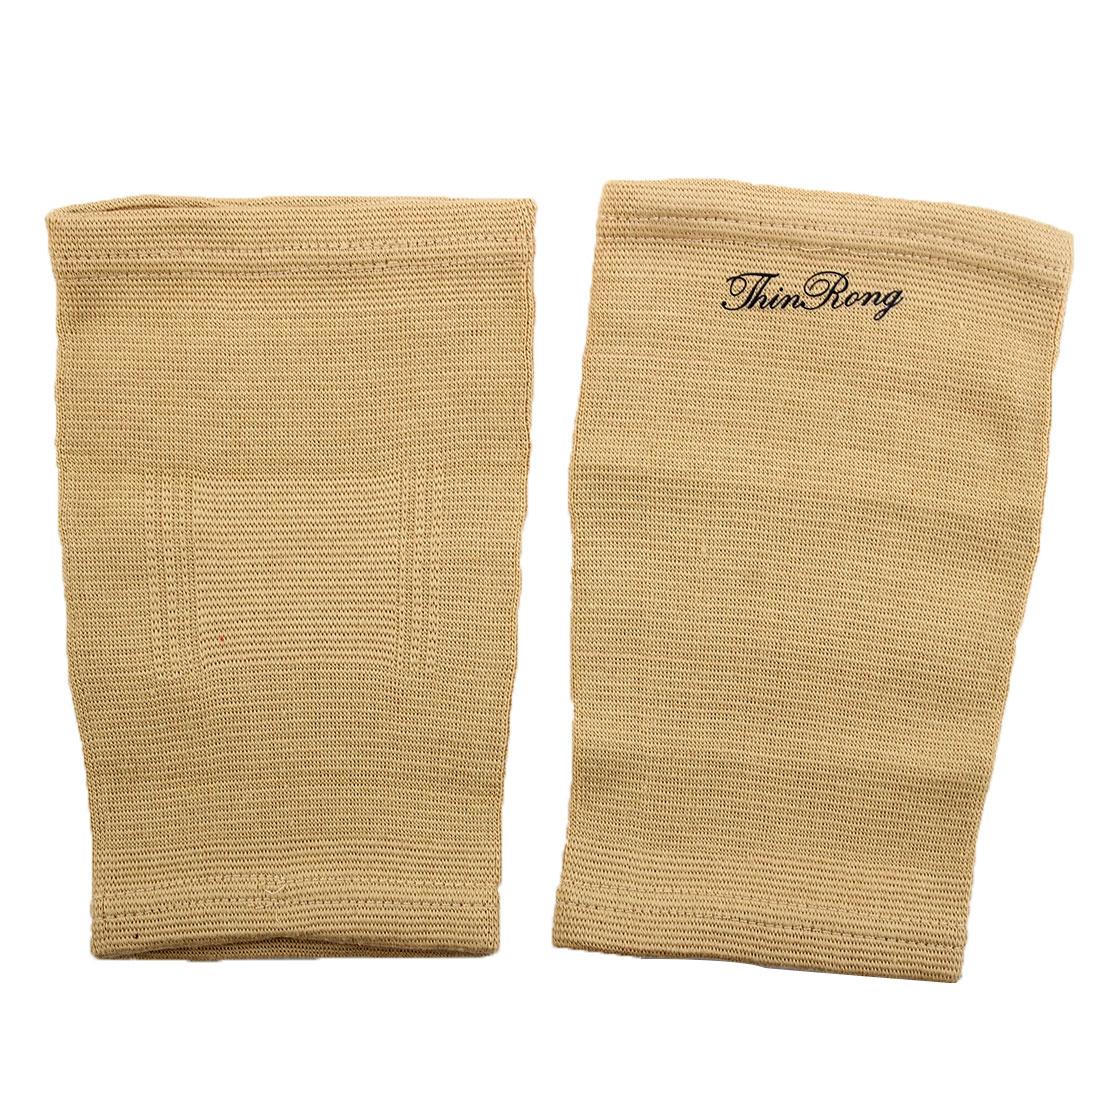 Sports Elastic Fabric Band Sleeve Knee Support Brace Protector Khaki Pair